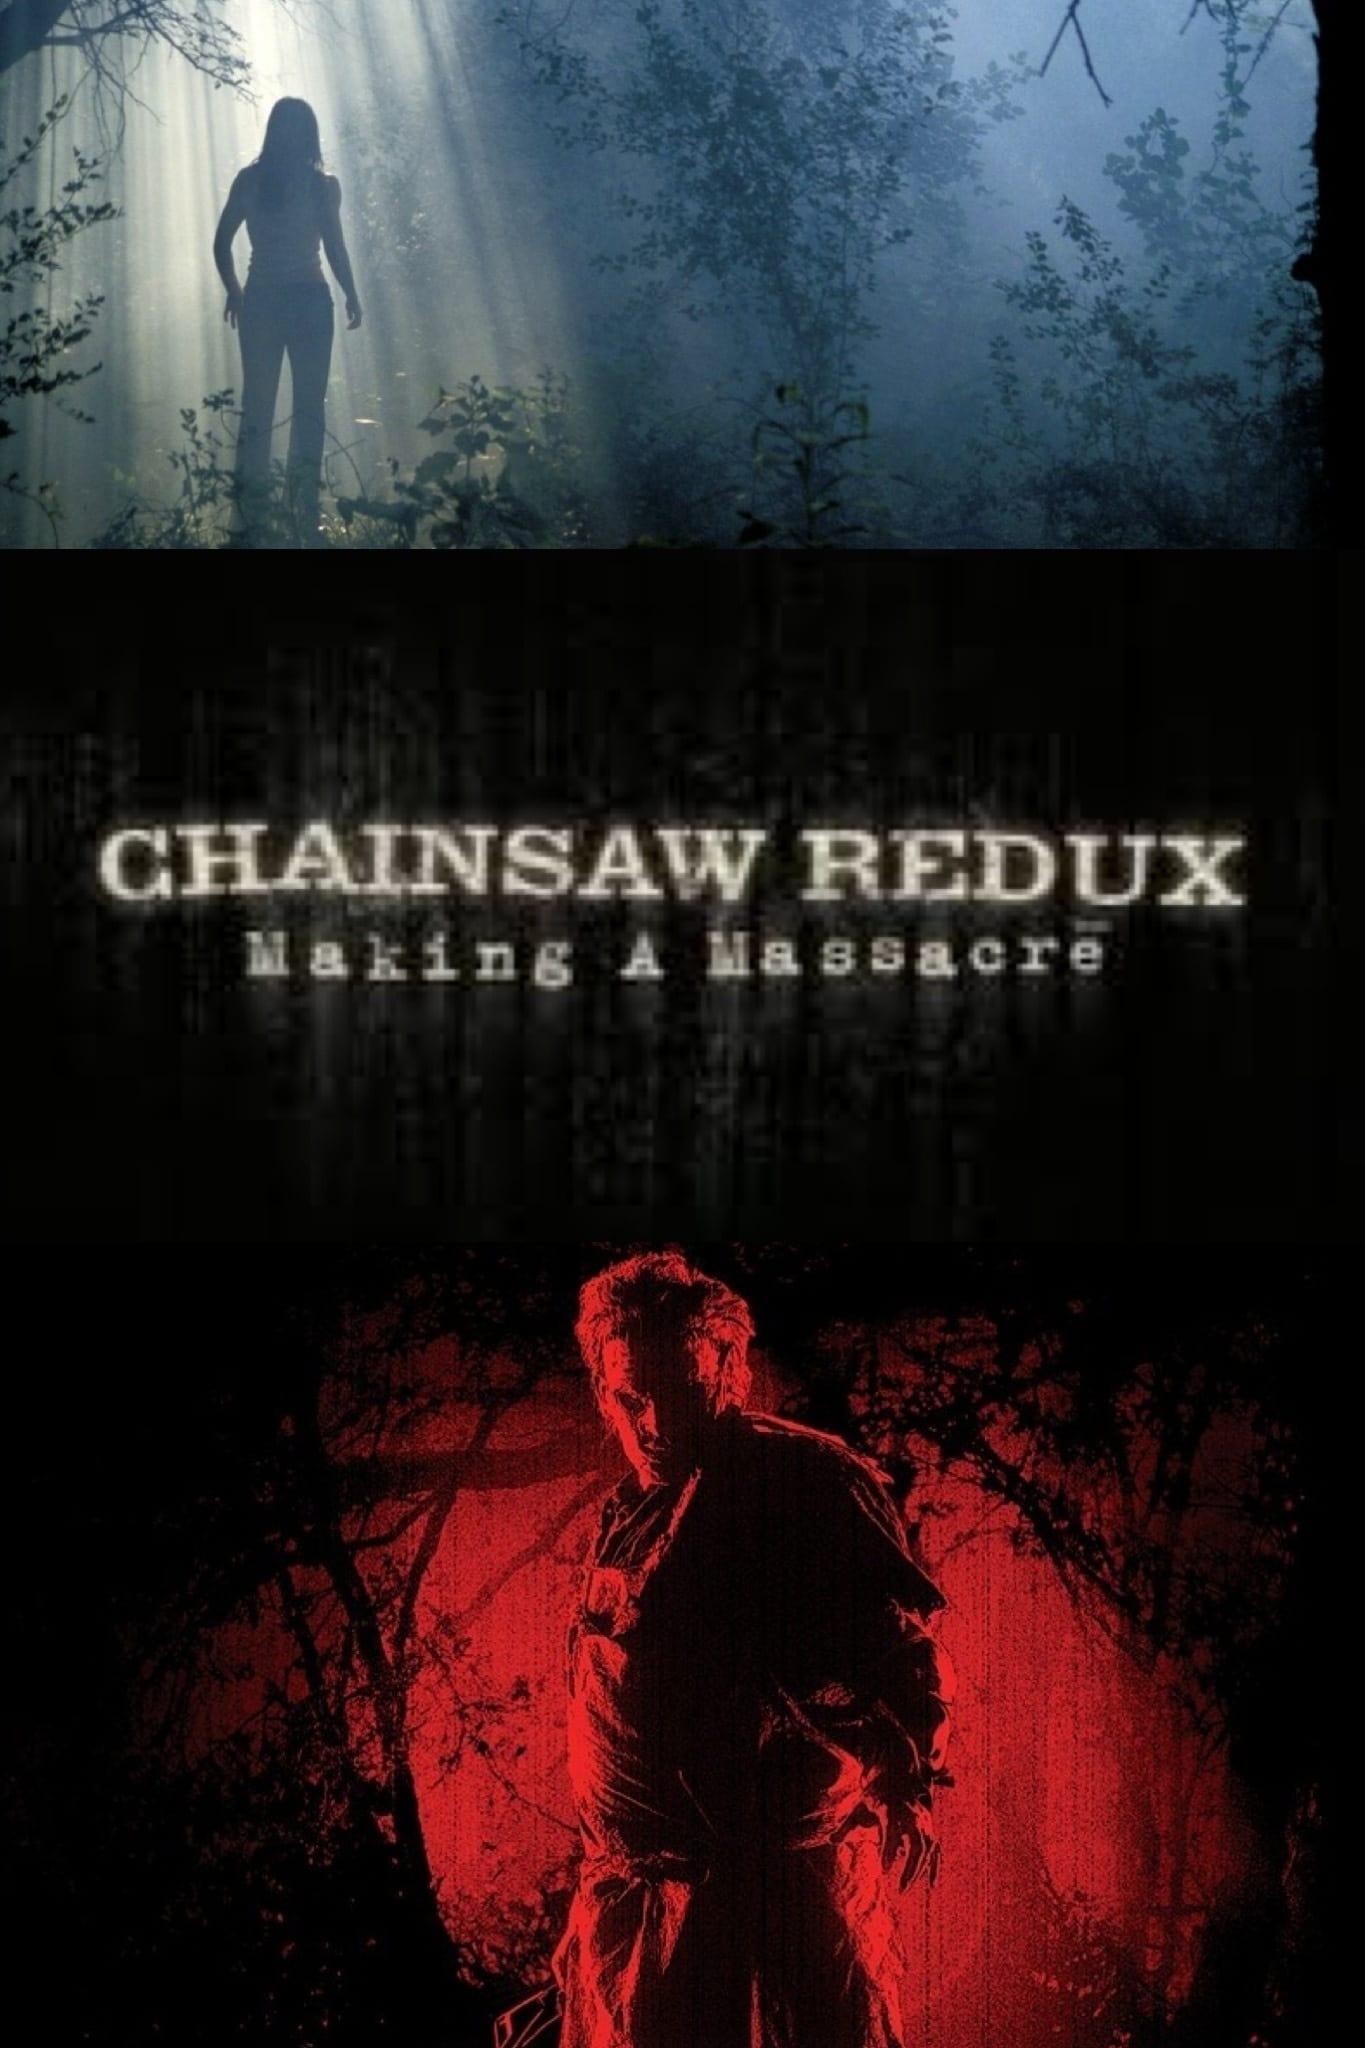 Chainsaw Redux: Making a Massacre